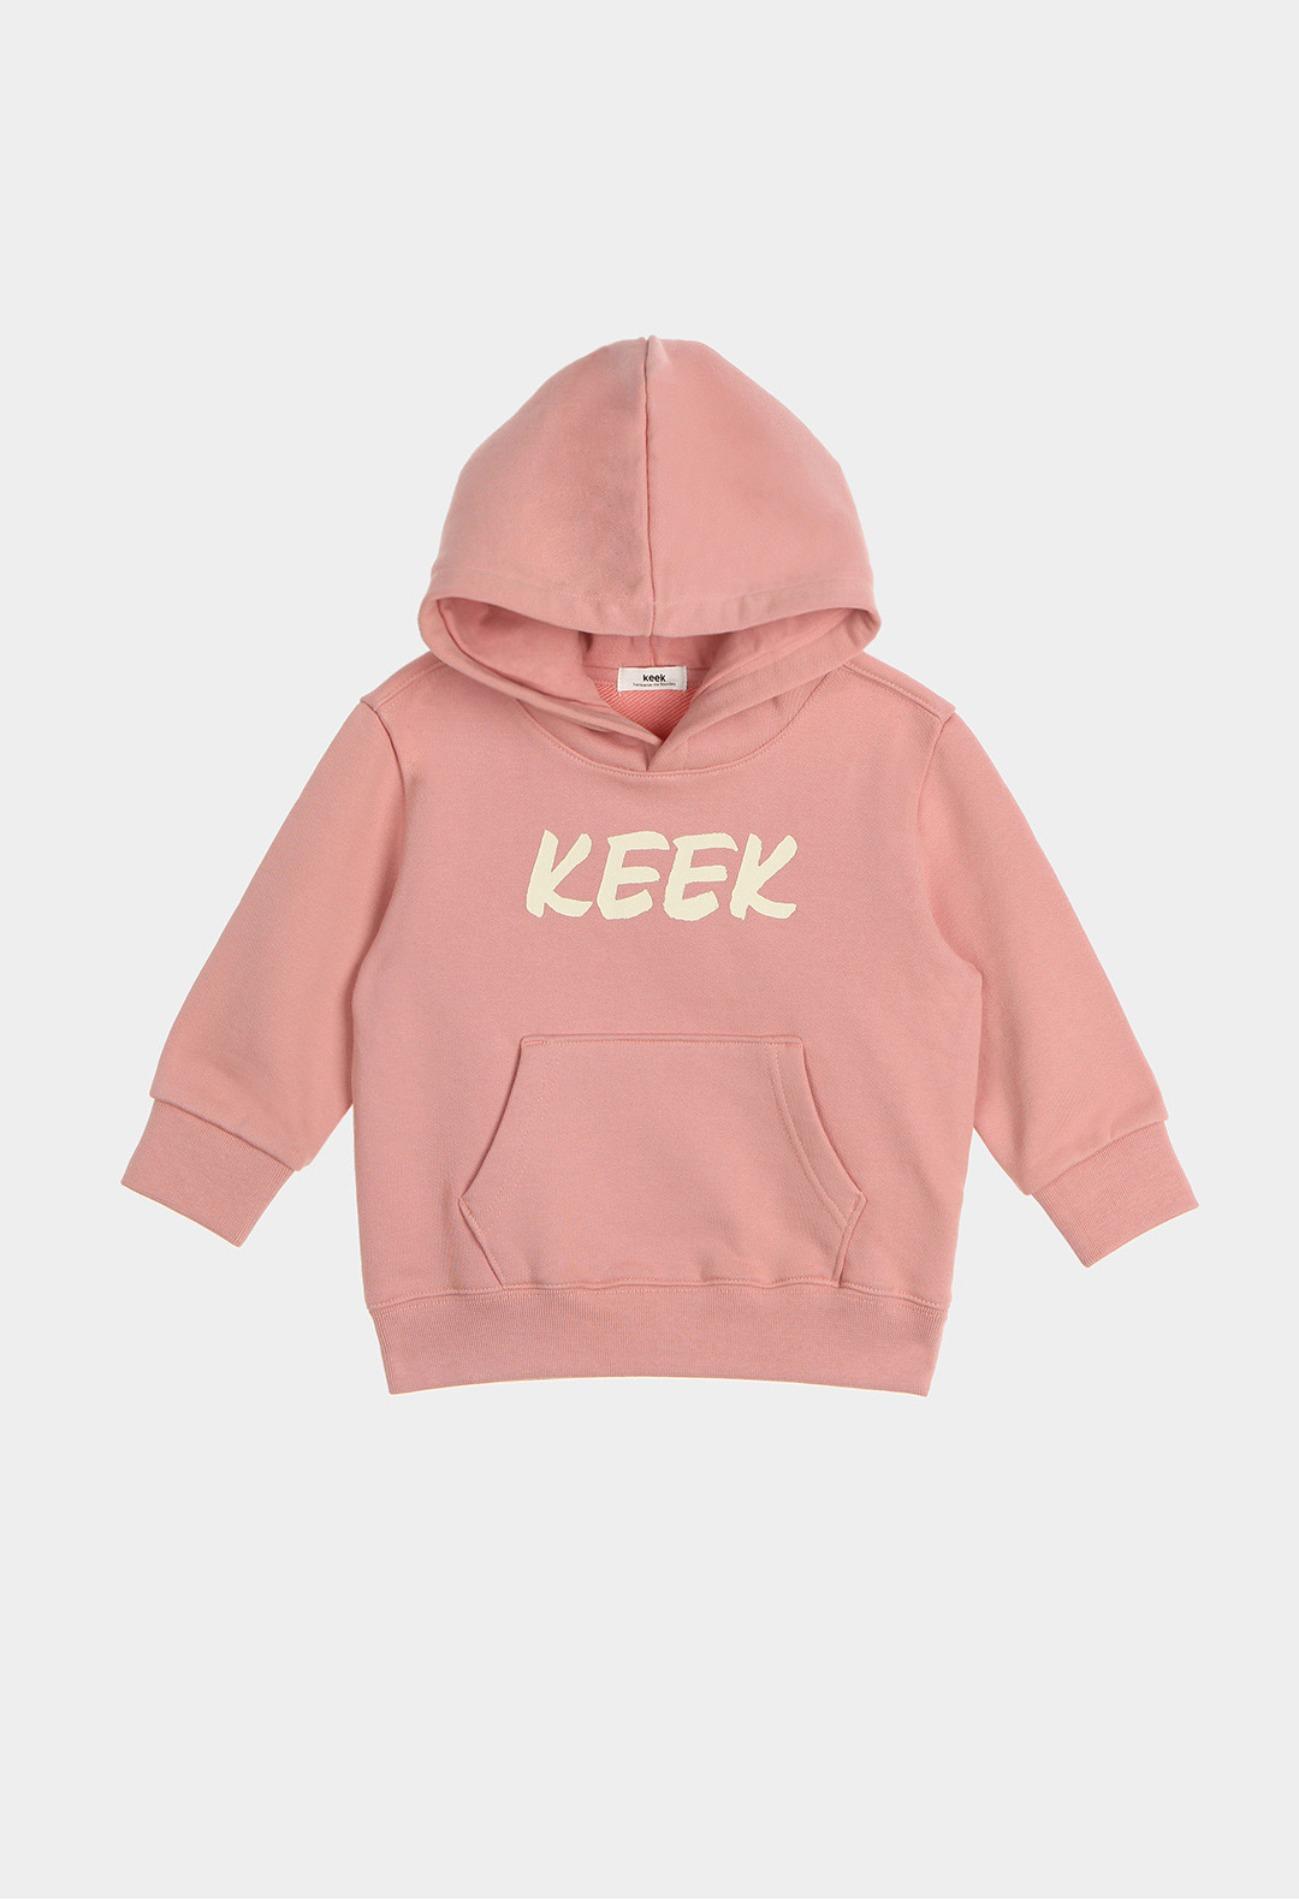 keek [Kids] KEEEK Hoodie - Vintage Pink 스트릿패션 유니섹스브랜드 커플시밀러룩 남자쇼핑몰 여성의류쇼핑몰 후드티 힙색